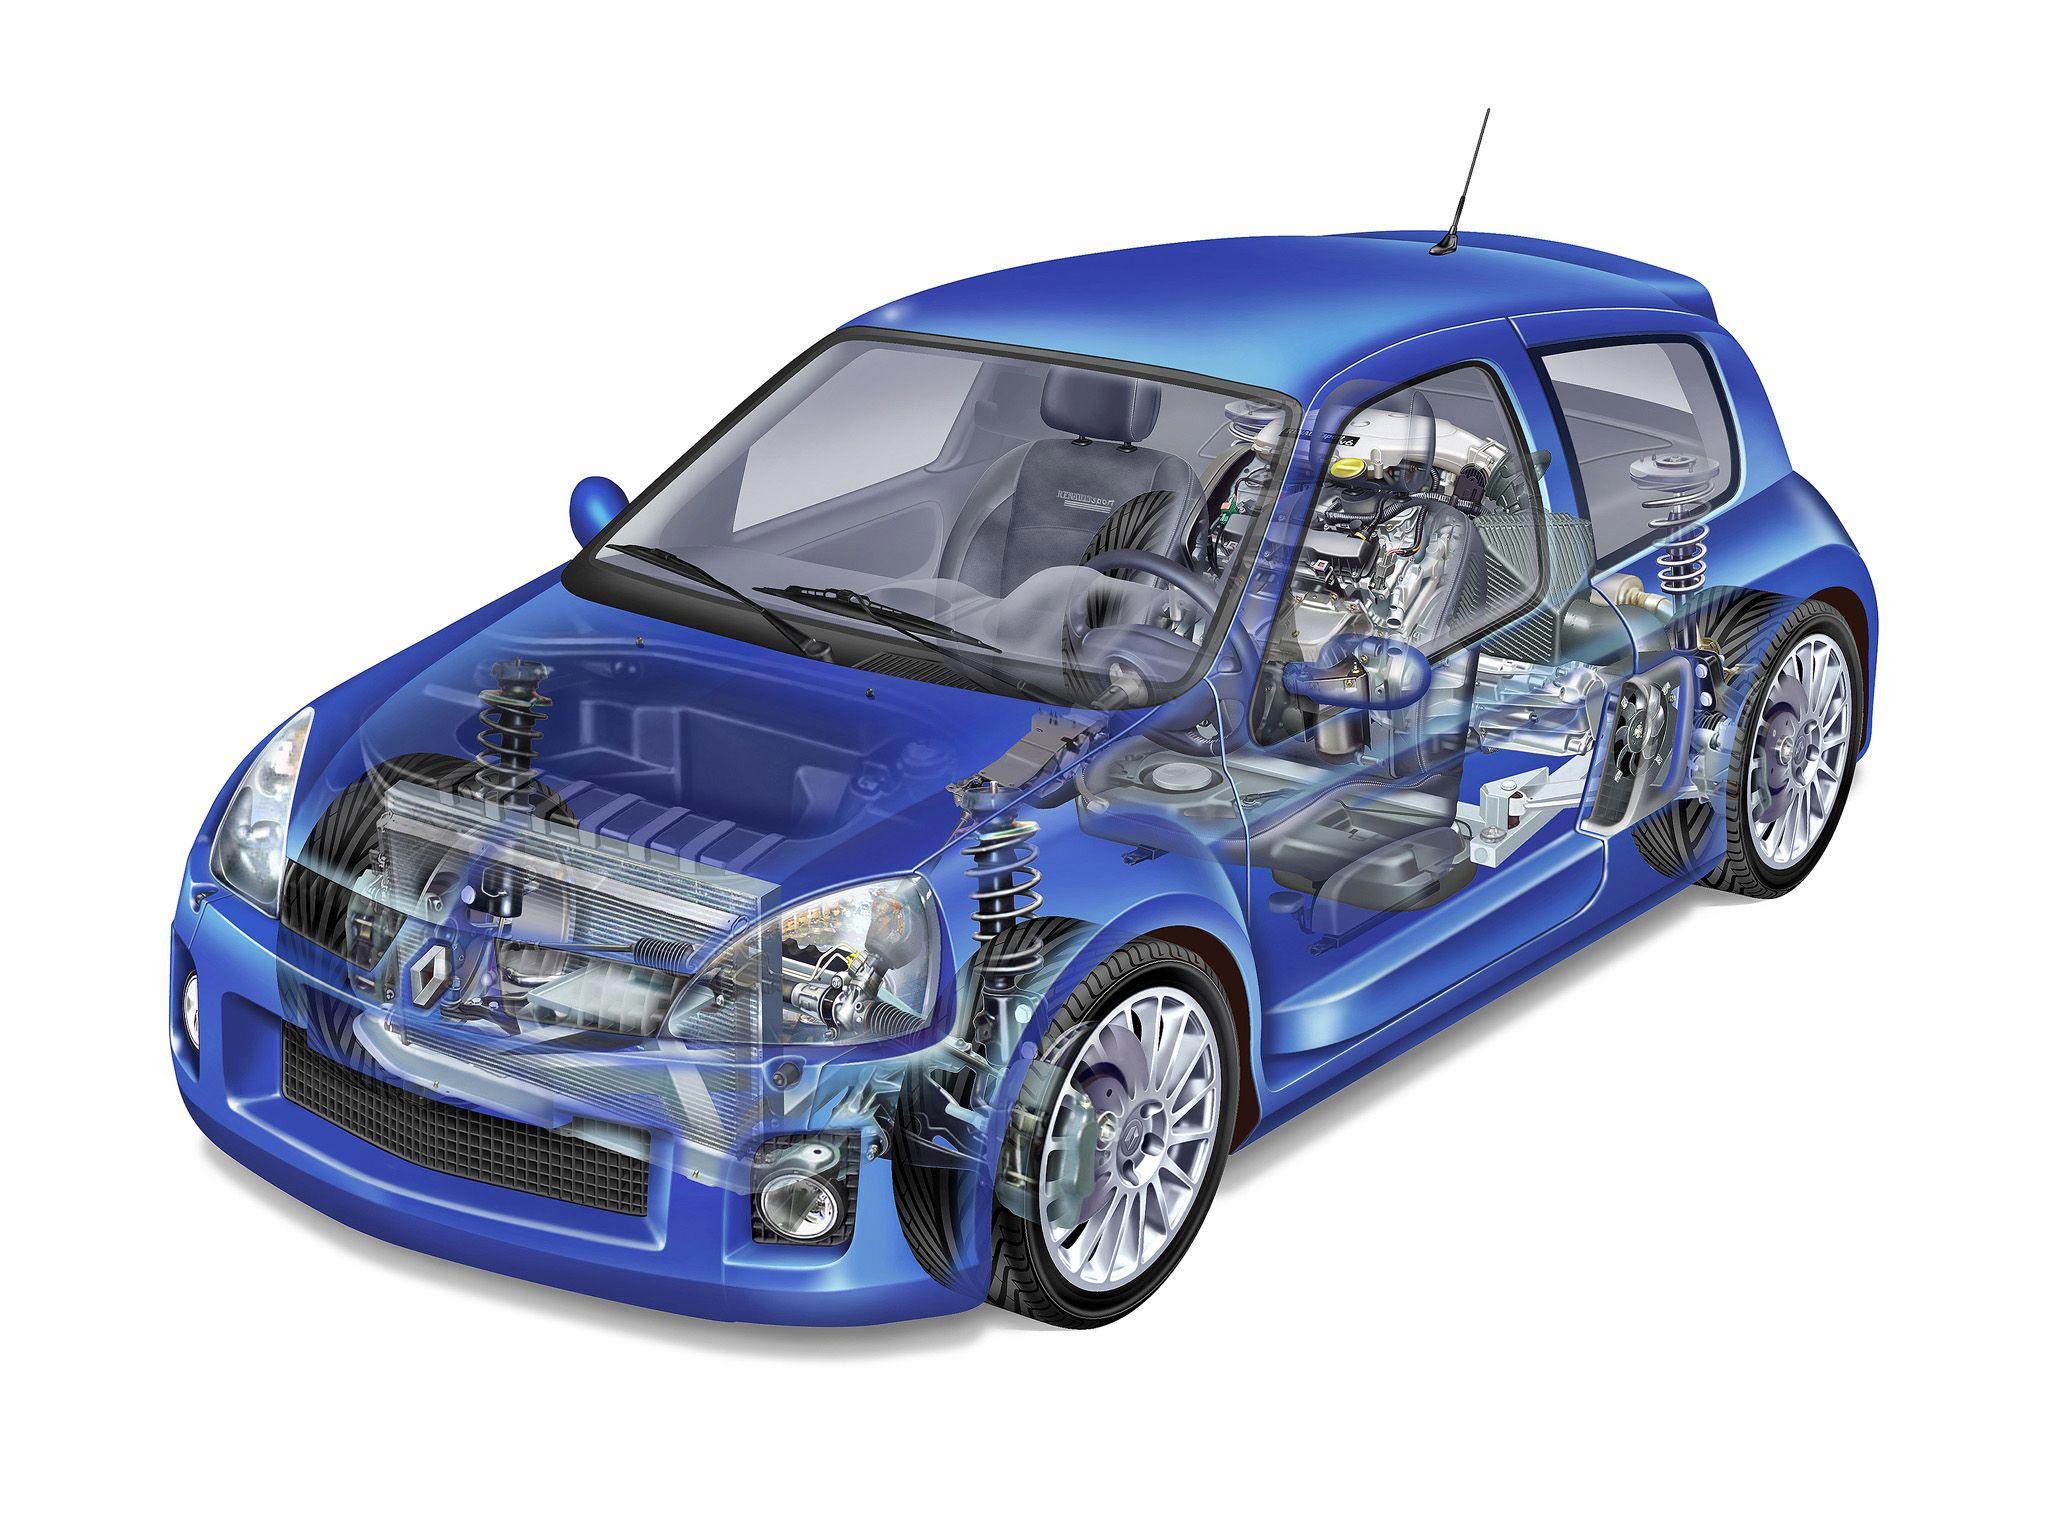 Renault Clio V6 cutaway drawing